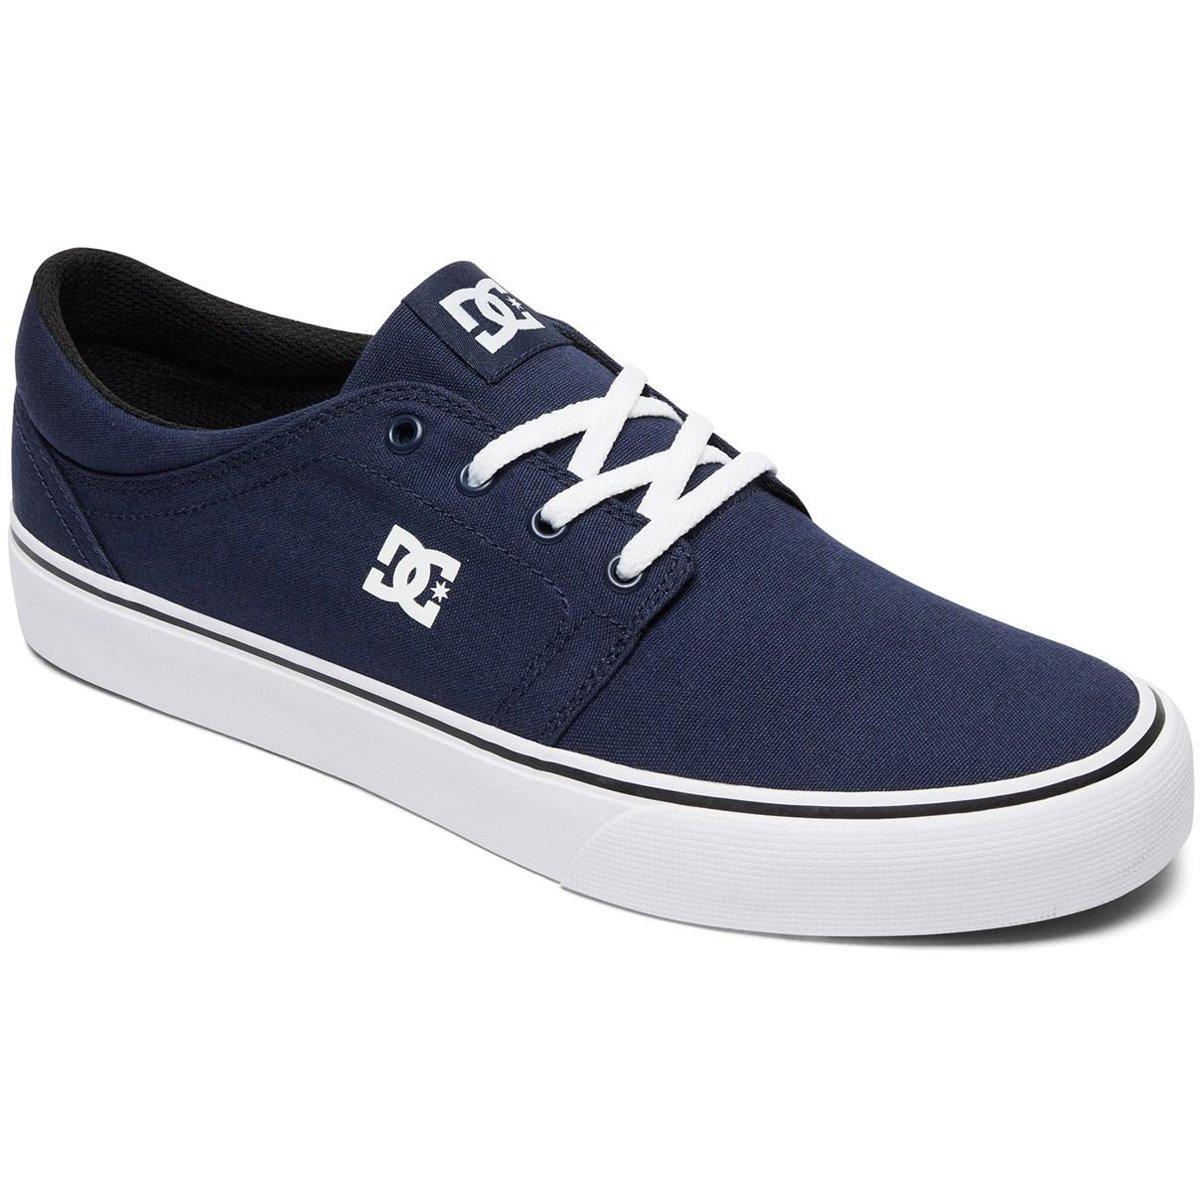 DC Men's Trase TX Unisex Skate Shoe B06ZY28WK6 11 D D US|Navy/White